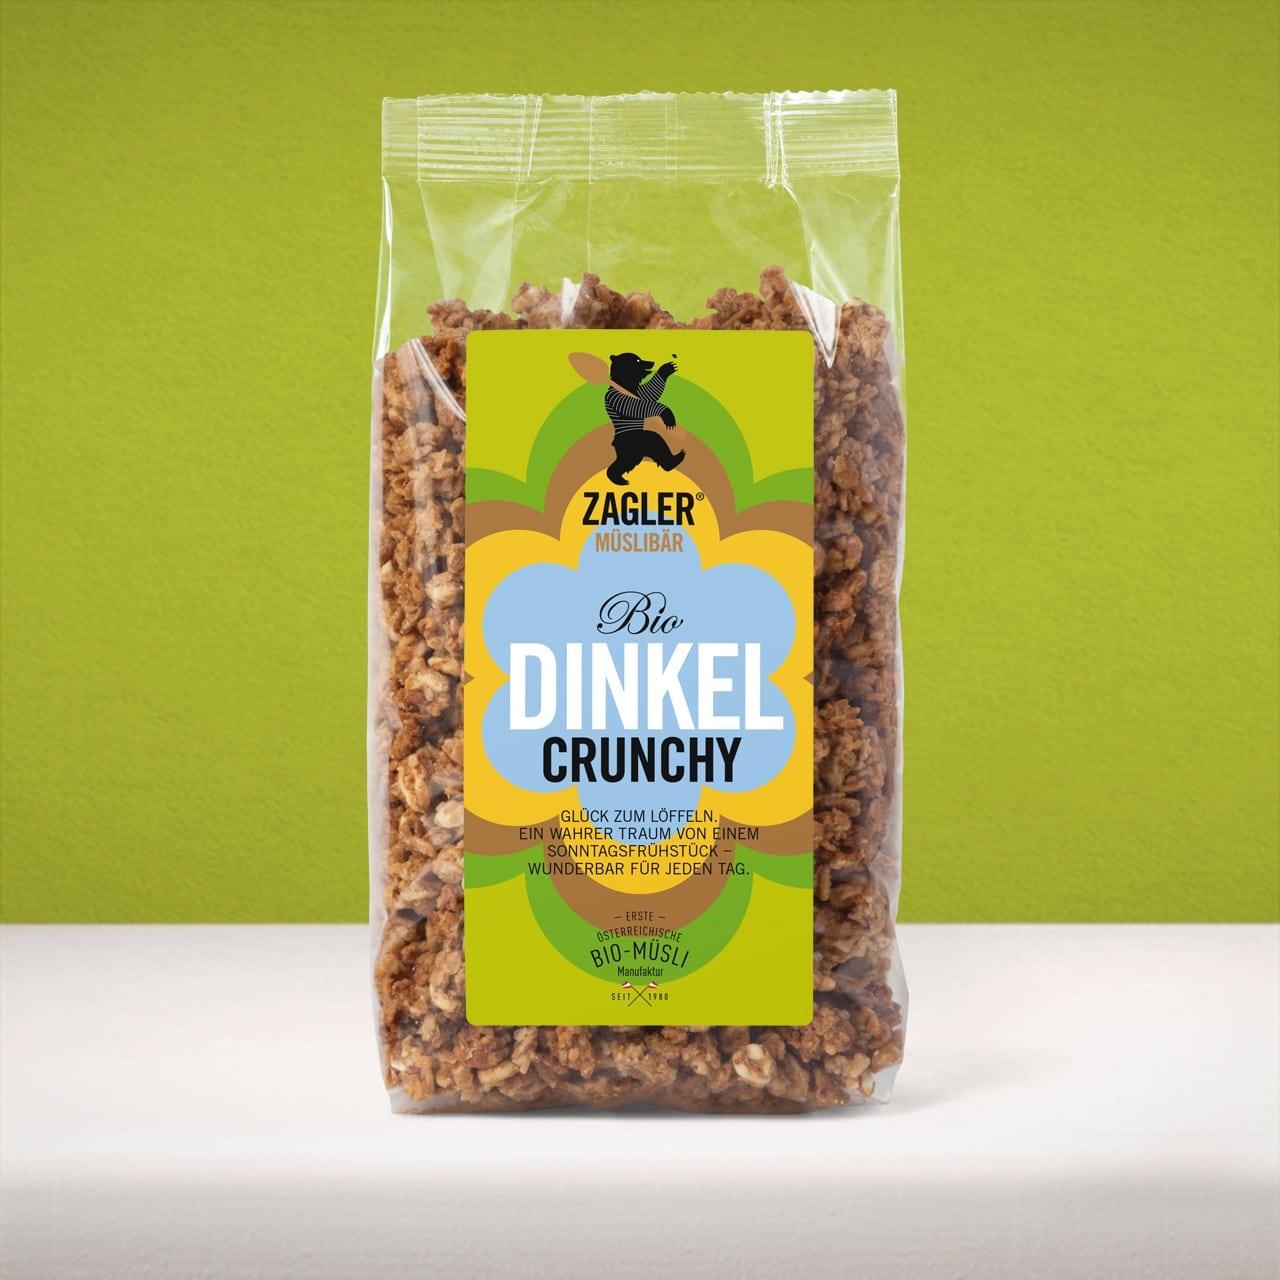 Bio Dinkel Crunchy muesli